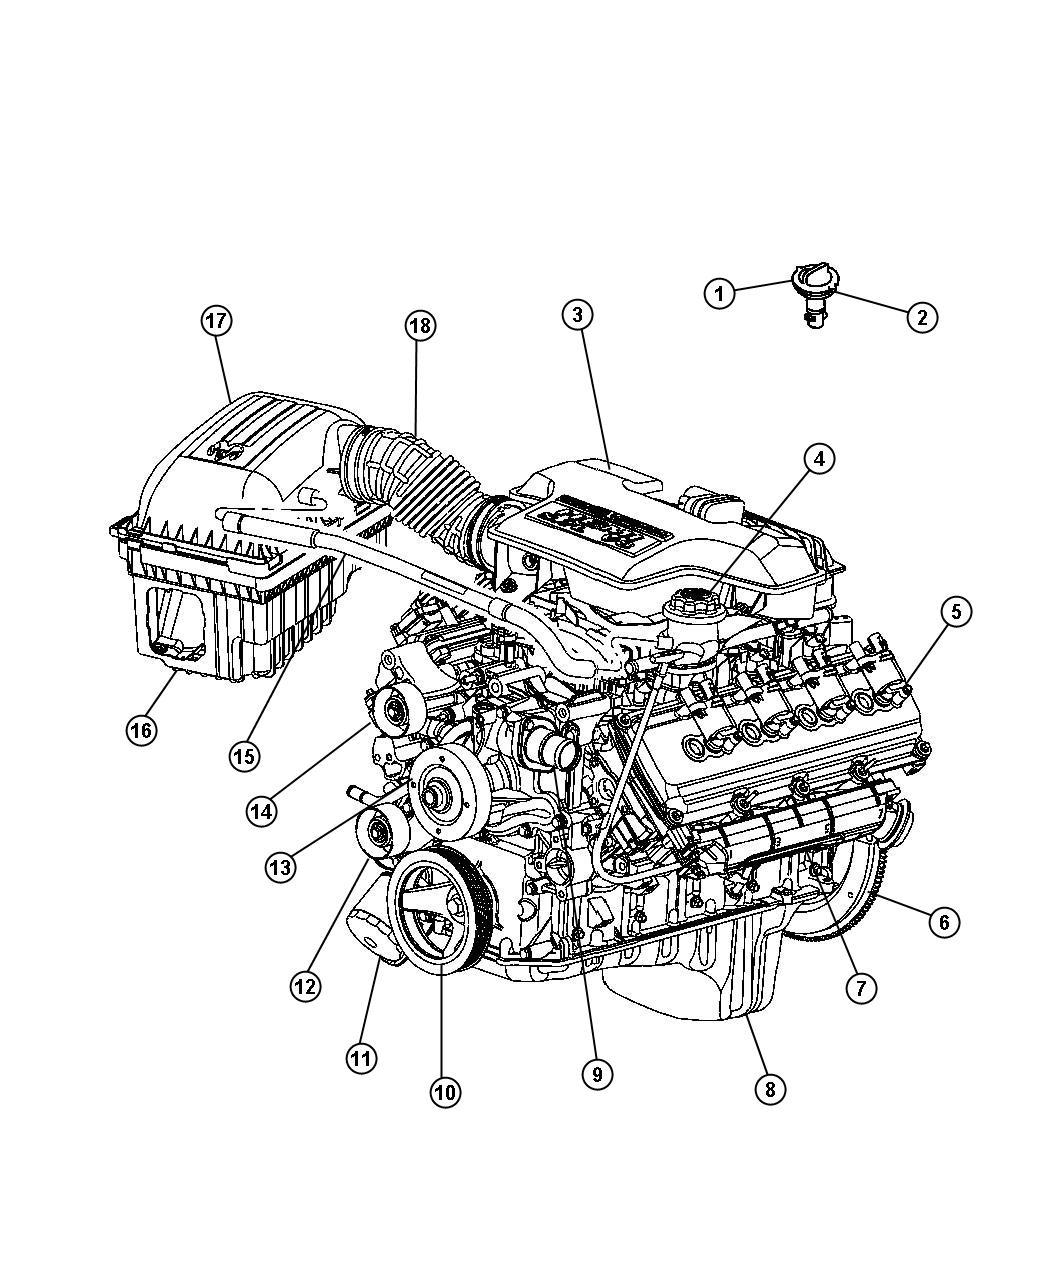 Jeep Patriot Pulley Idler Engine Alternator